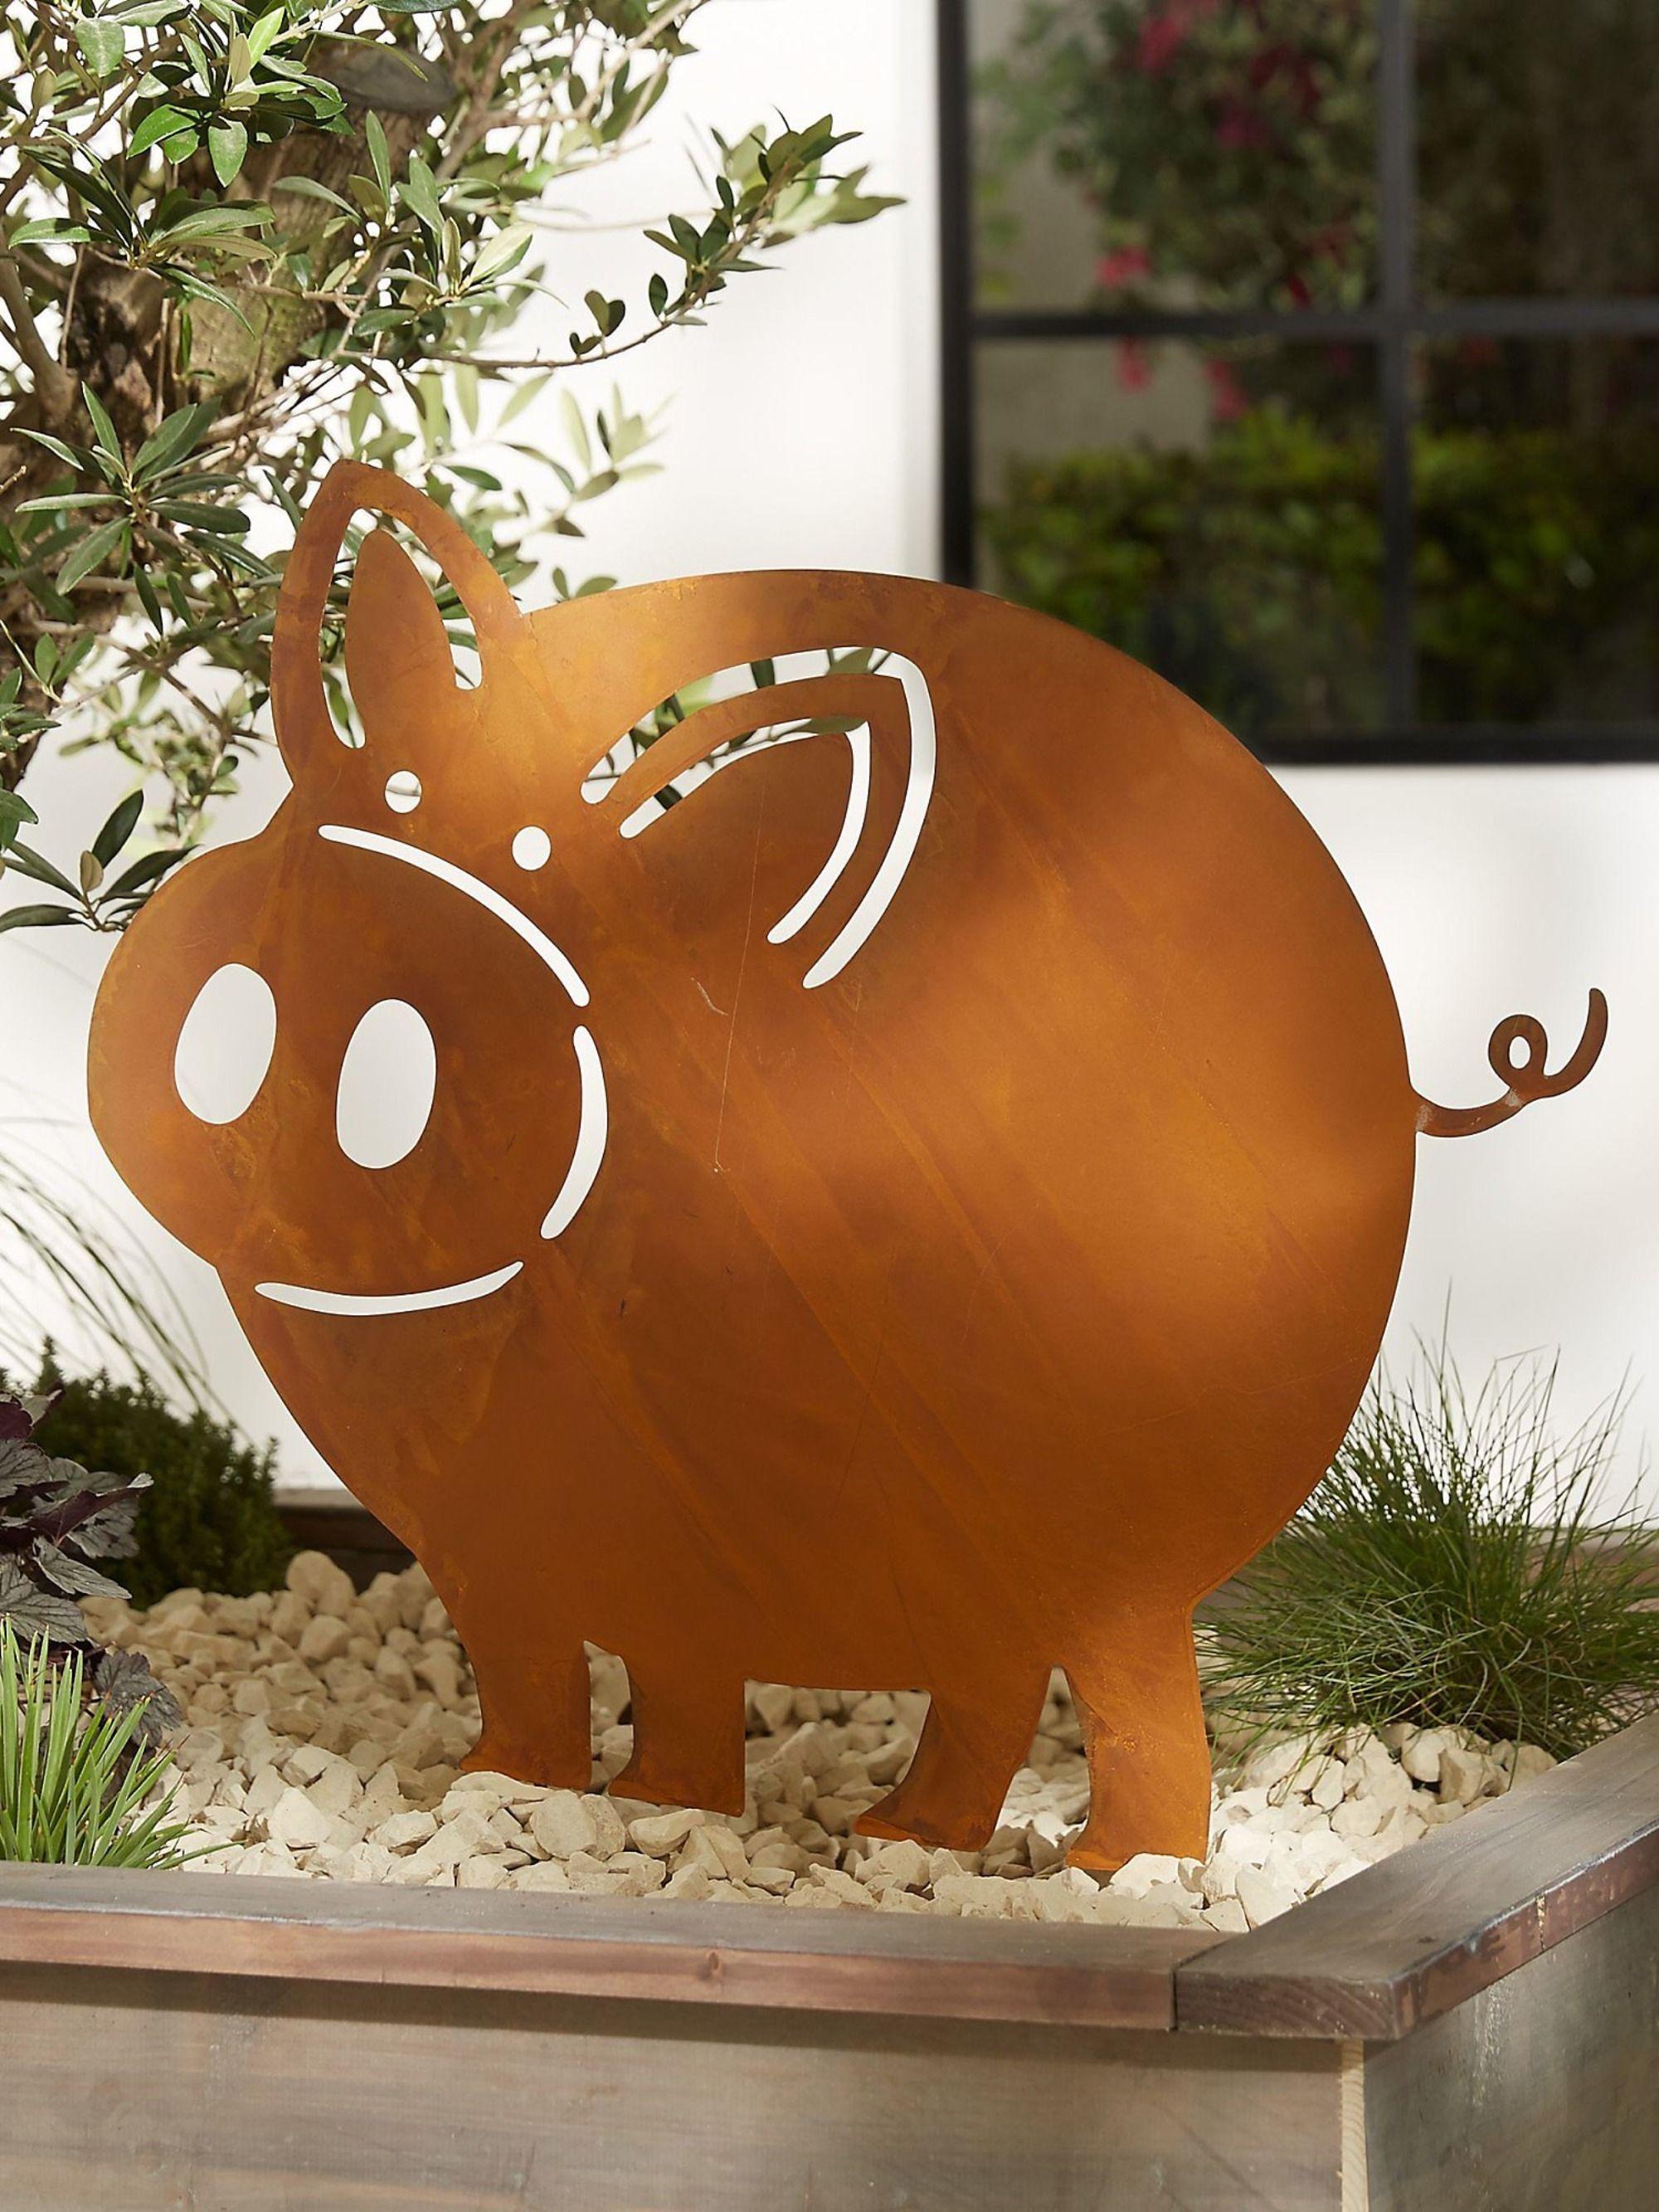 Gartenstecker Schwein Leon Jetzt Bei Weltbild De Bestellen Gartenstecker Herbst Veranda Dekorationen Rost Deko Garten